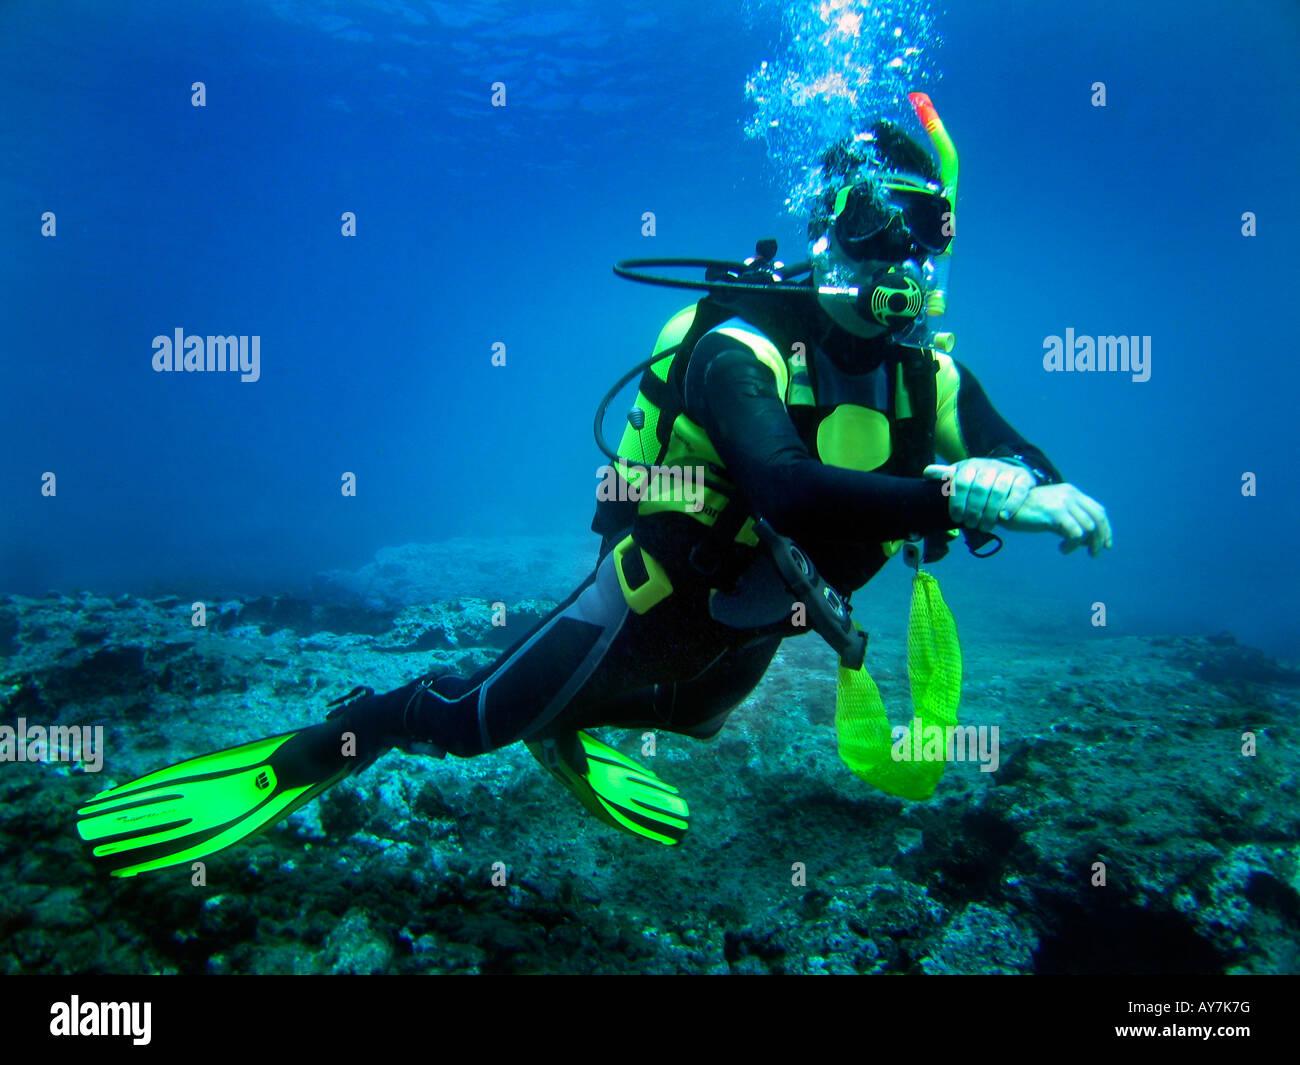 Diver performing underwater buoyancy control - Stock Image